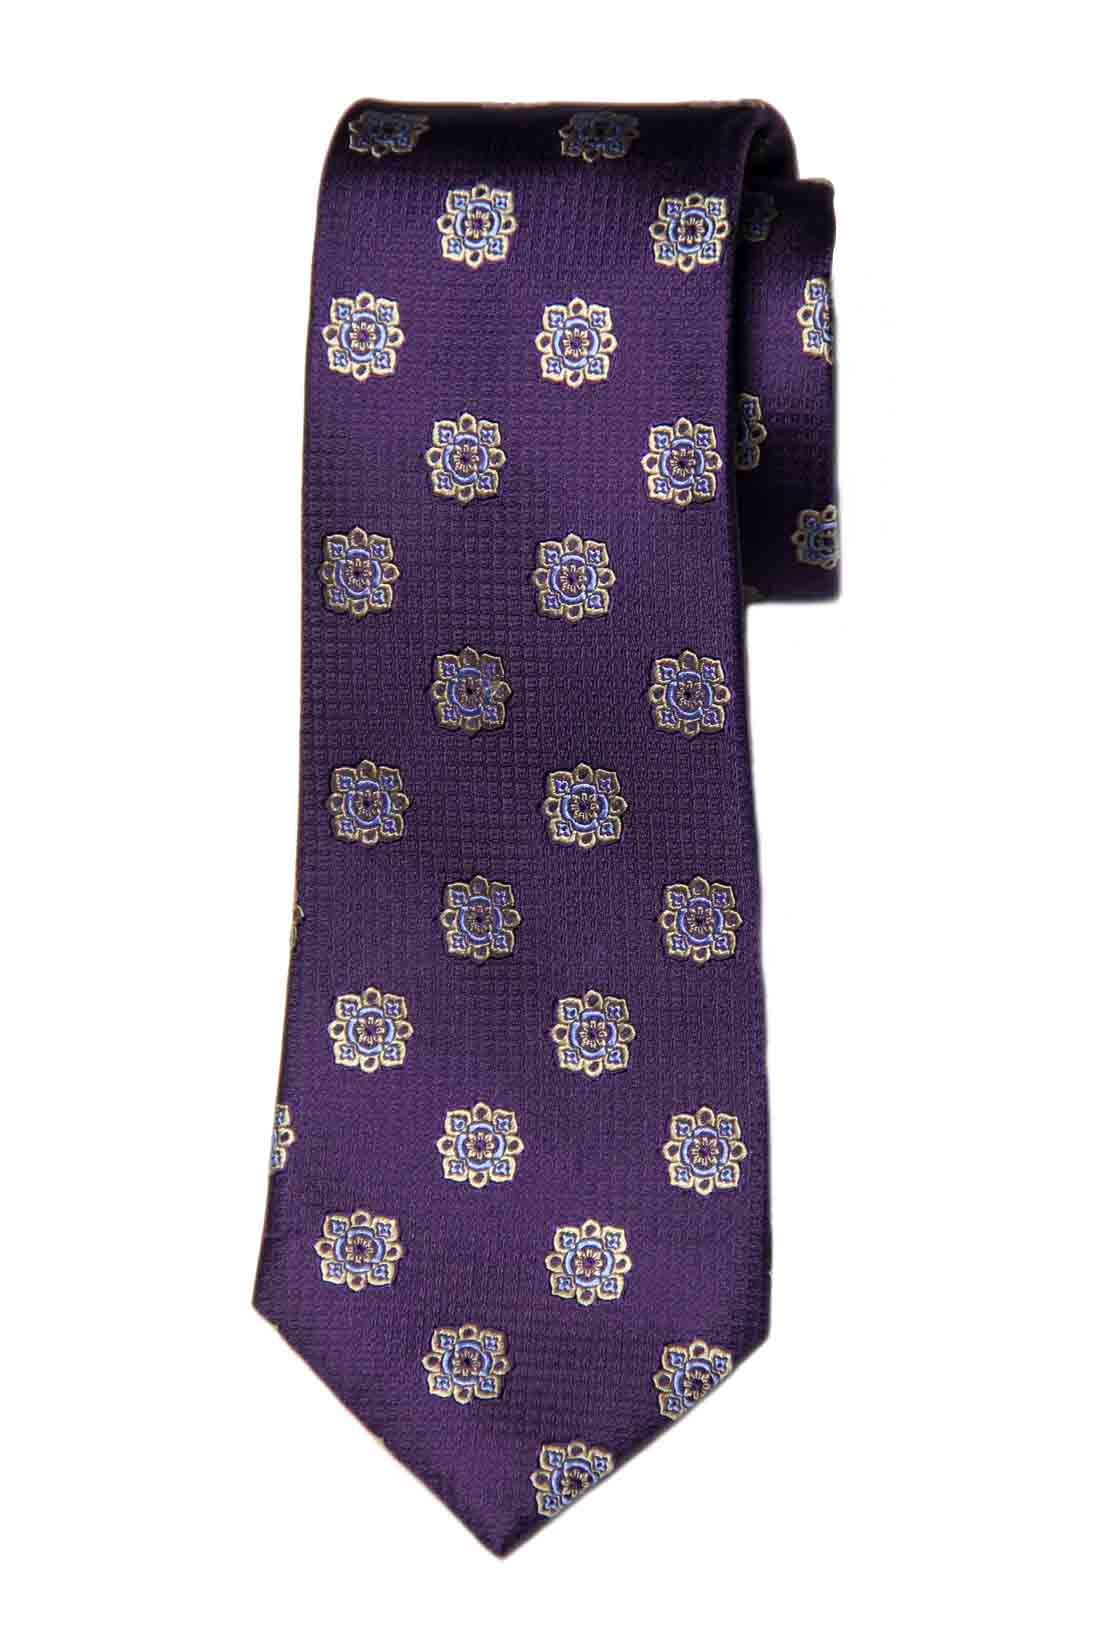 Tasso Elba Silk Tie Purple Yellow Blue Floral Men's